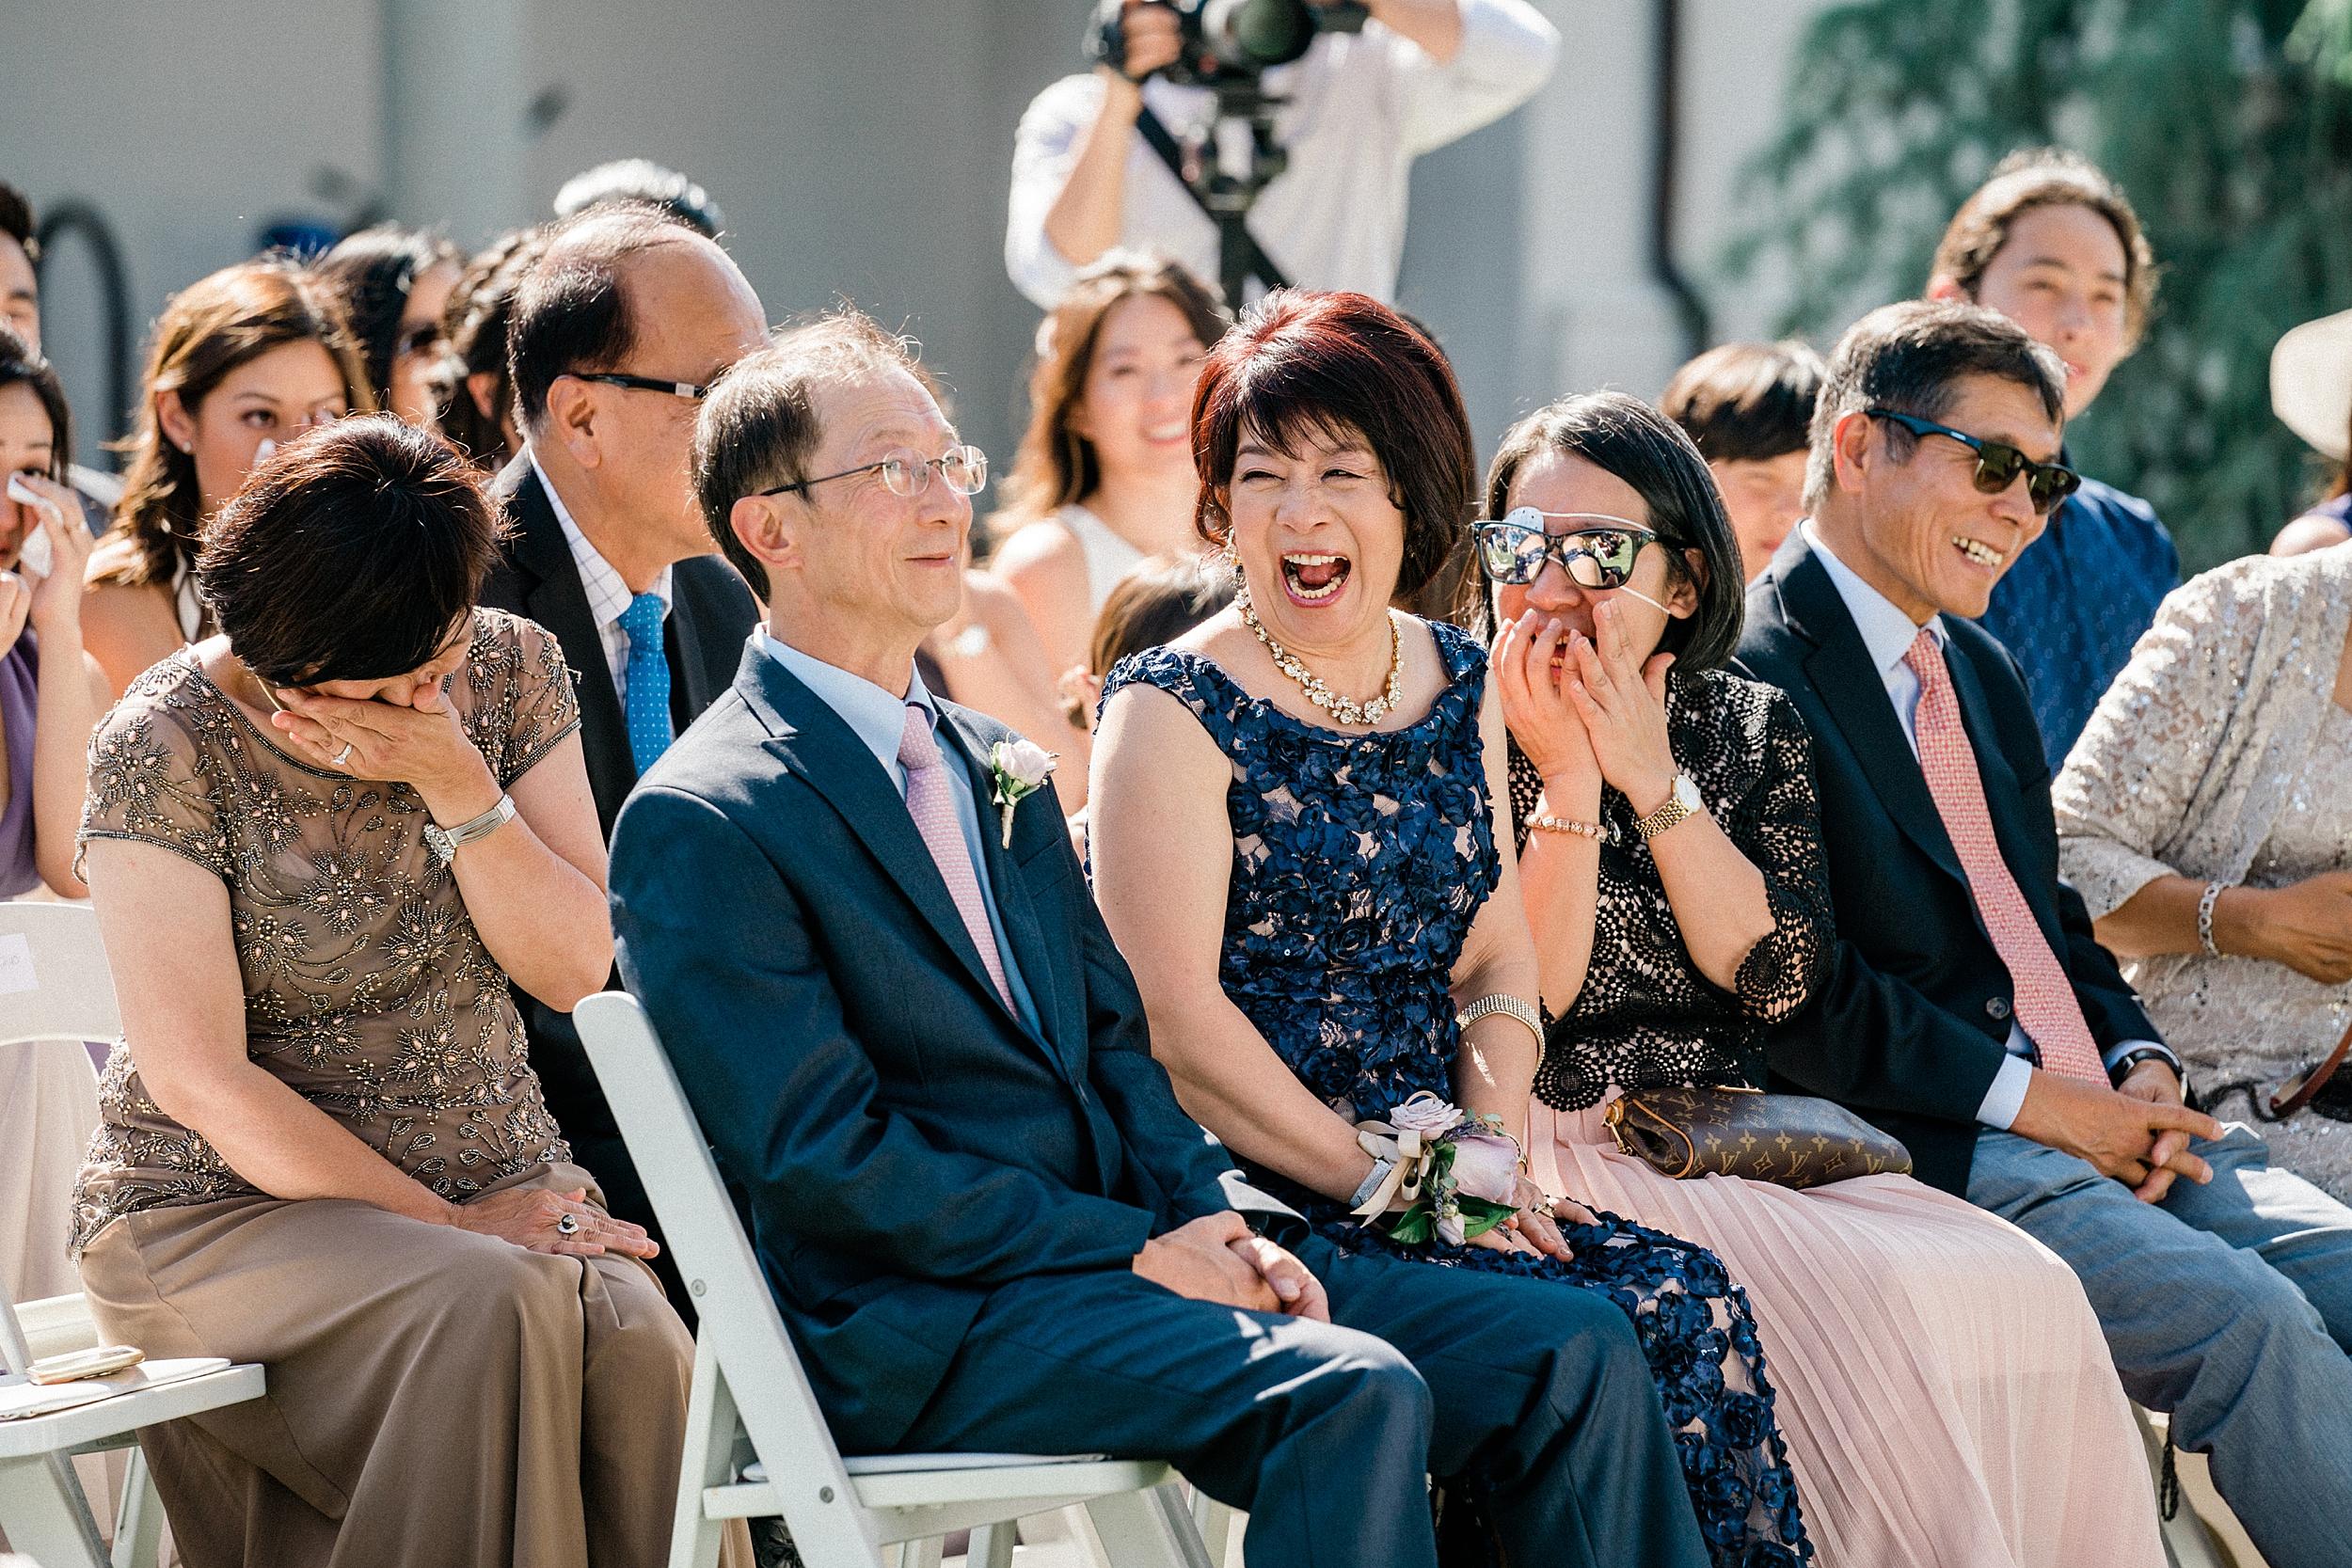 Caltech Wedding Stewart and Connie Photography_0013.jpg